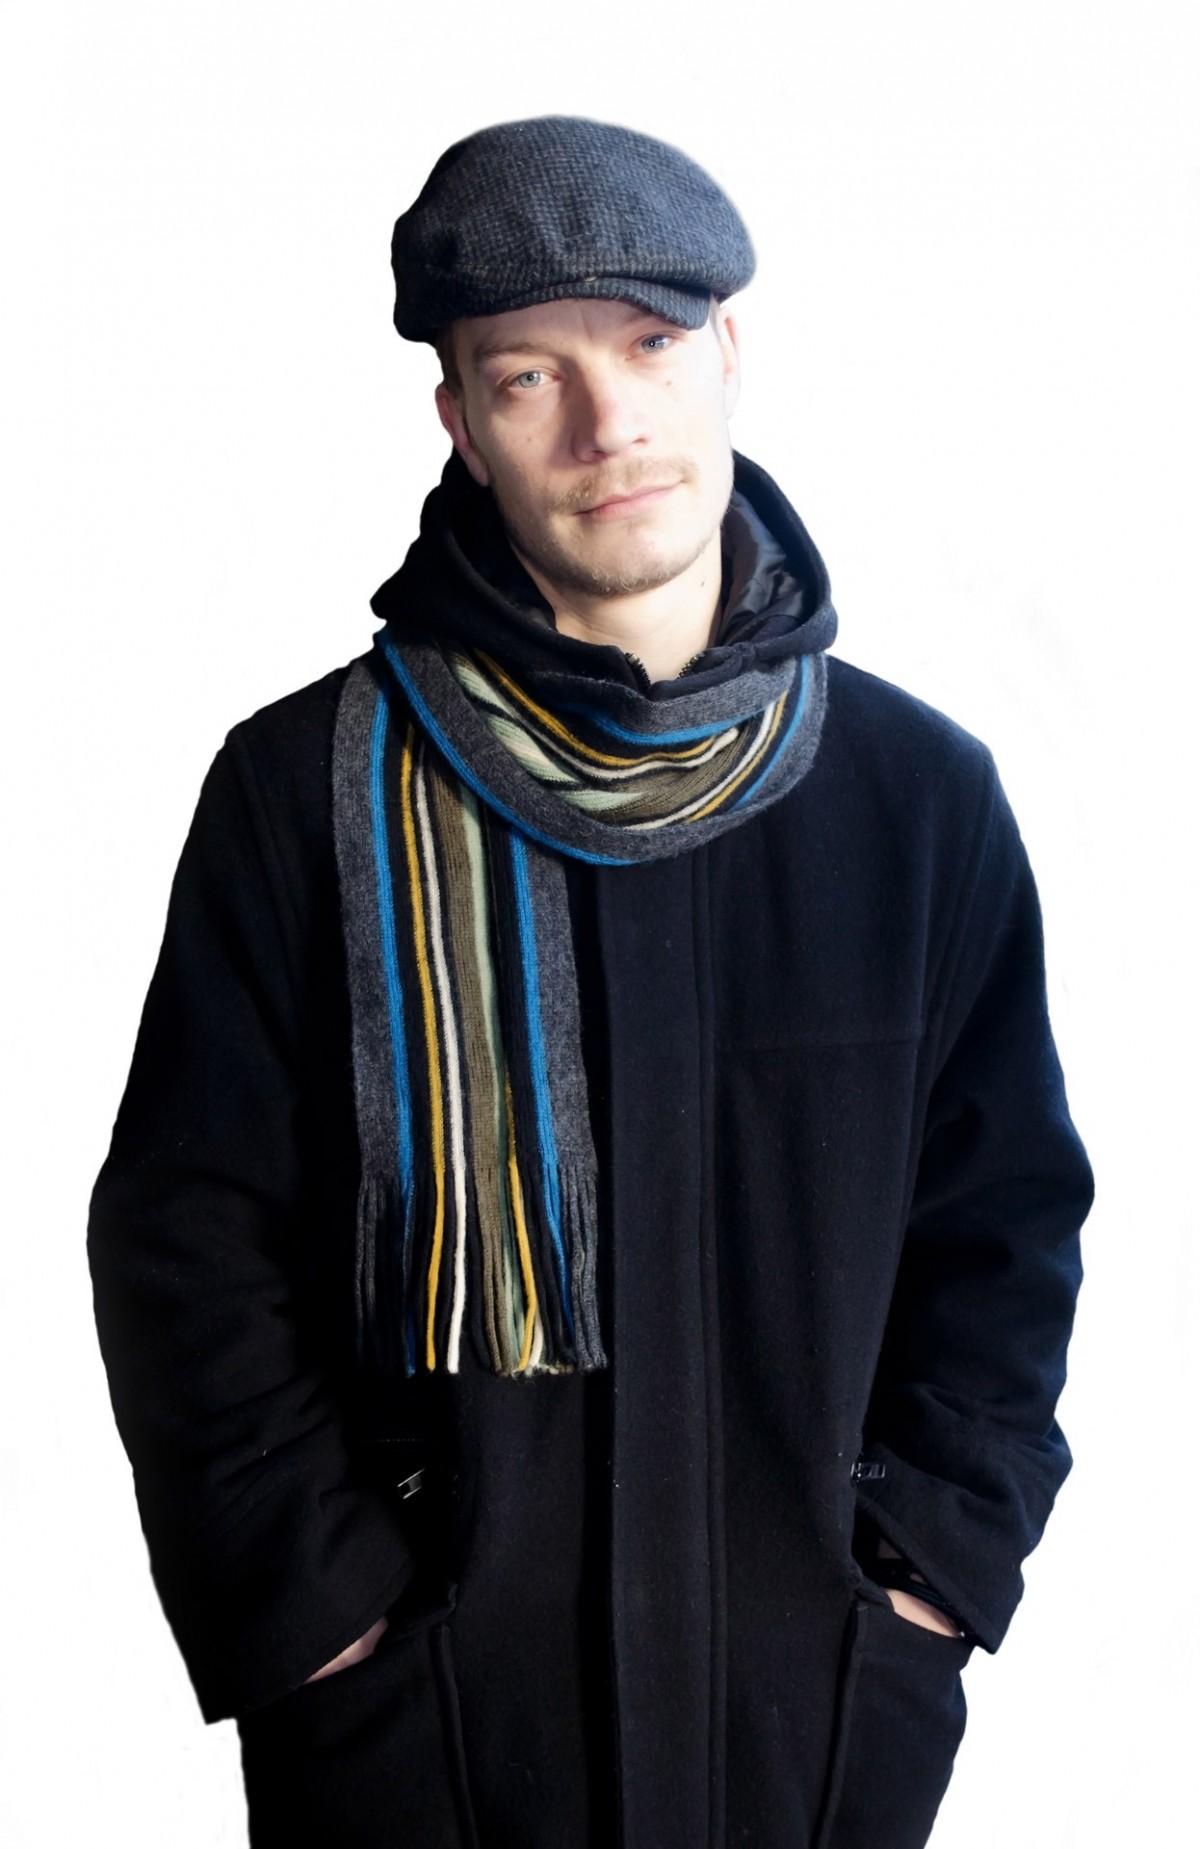 mode masculine - manteau